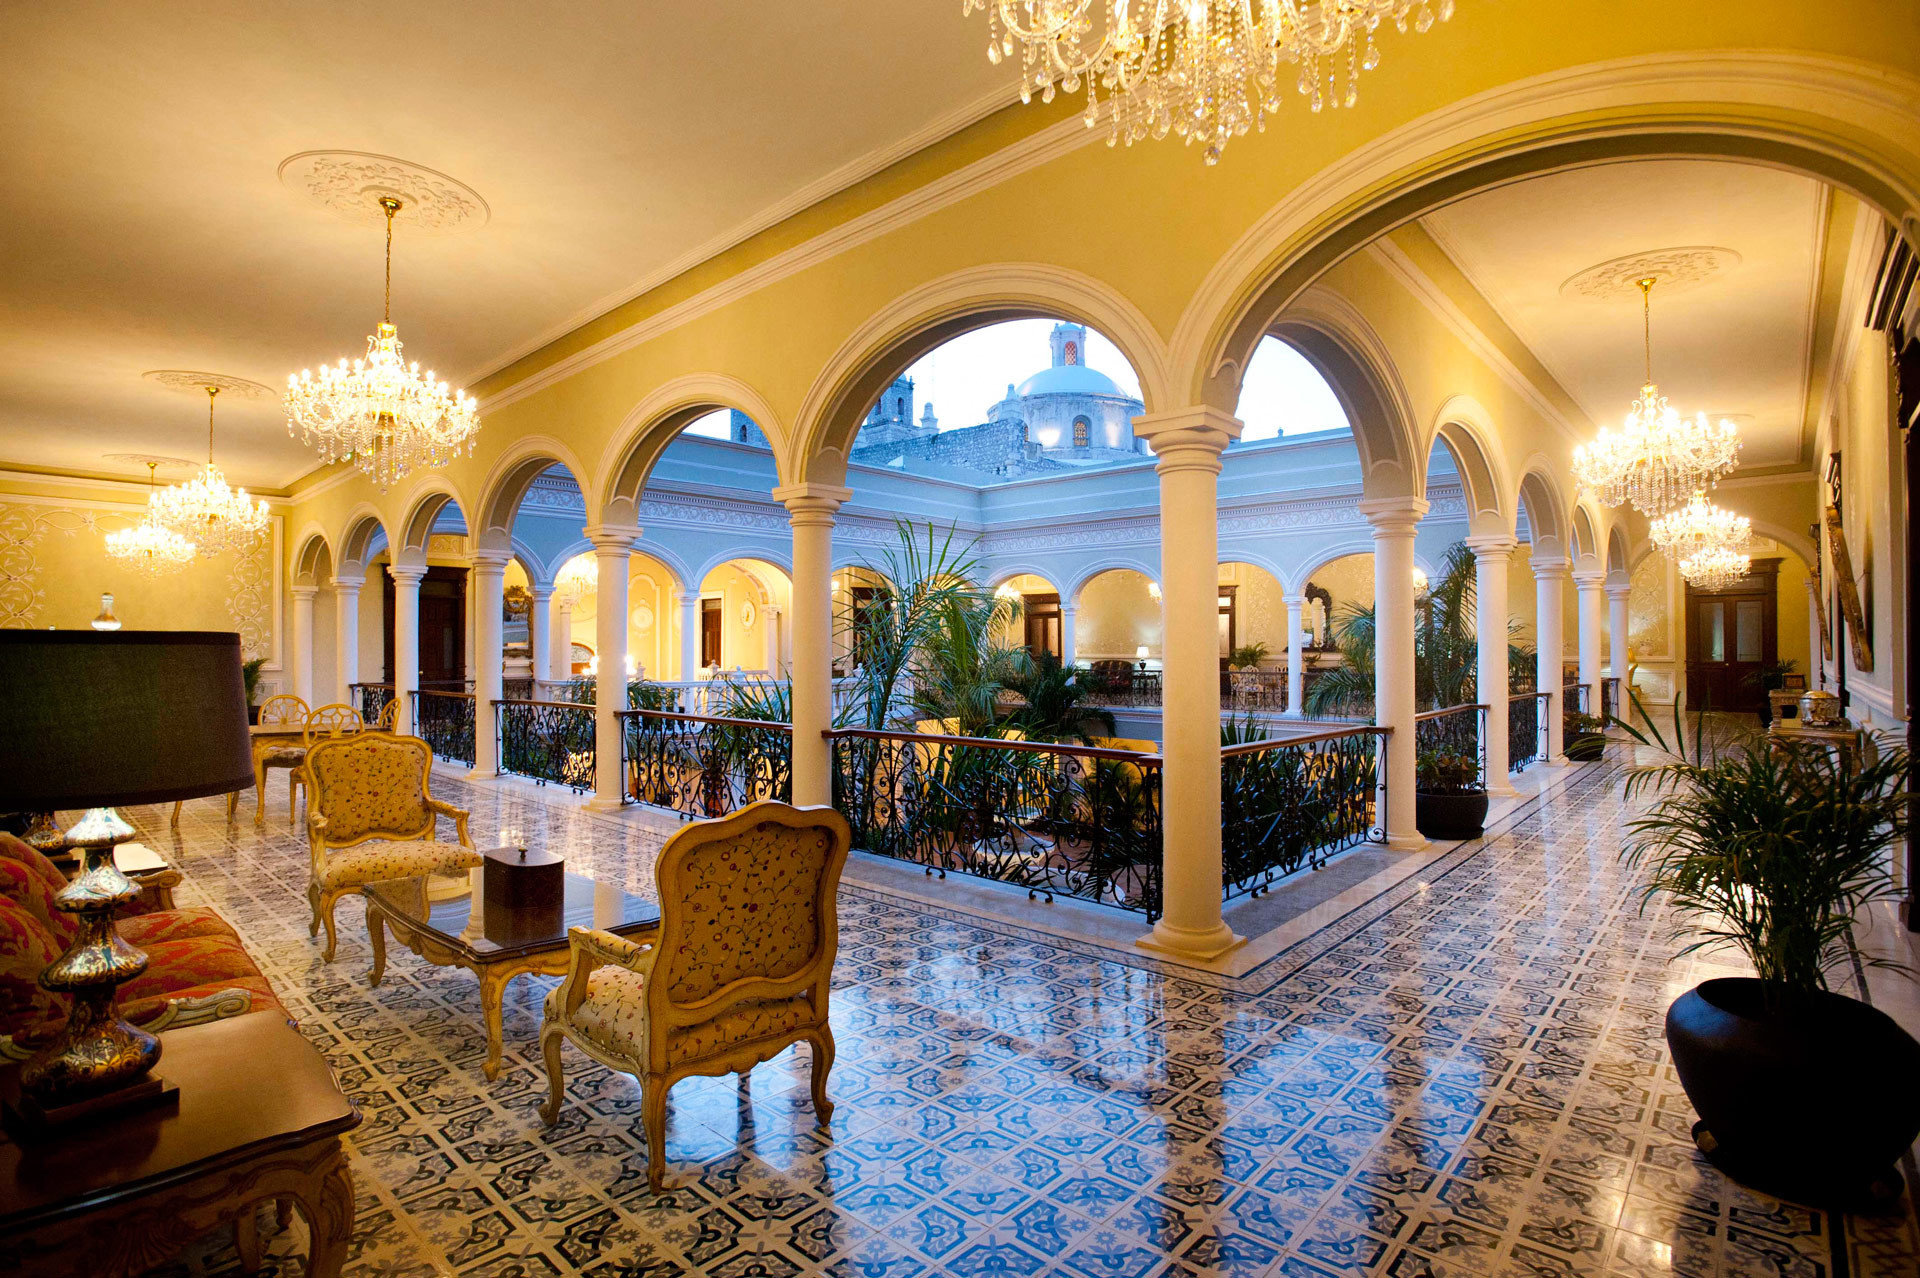 Elegant Lounge Lobby palace function hall Resort restaurant ballroom mansion hacienda